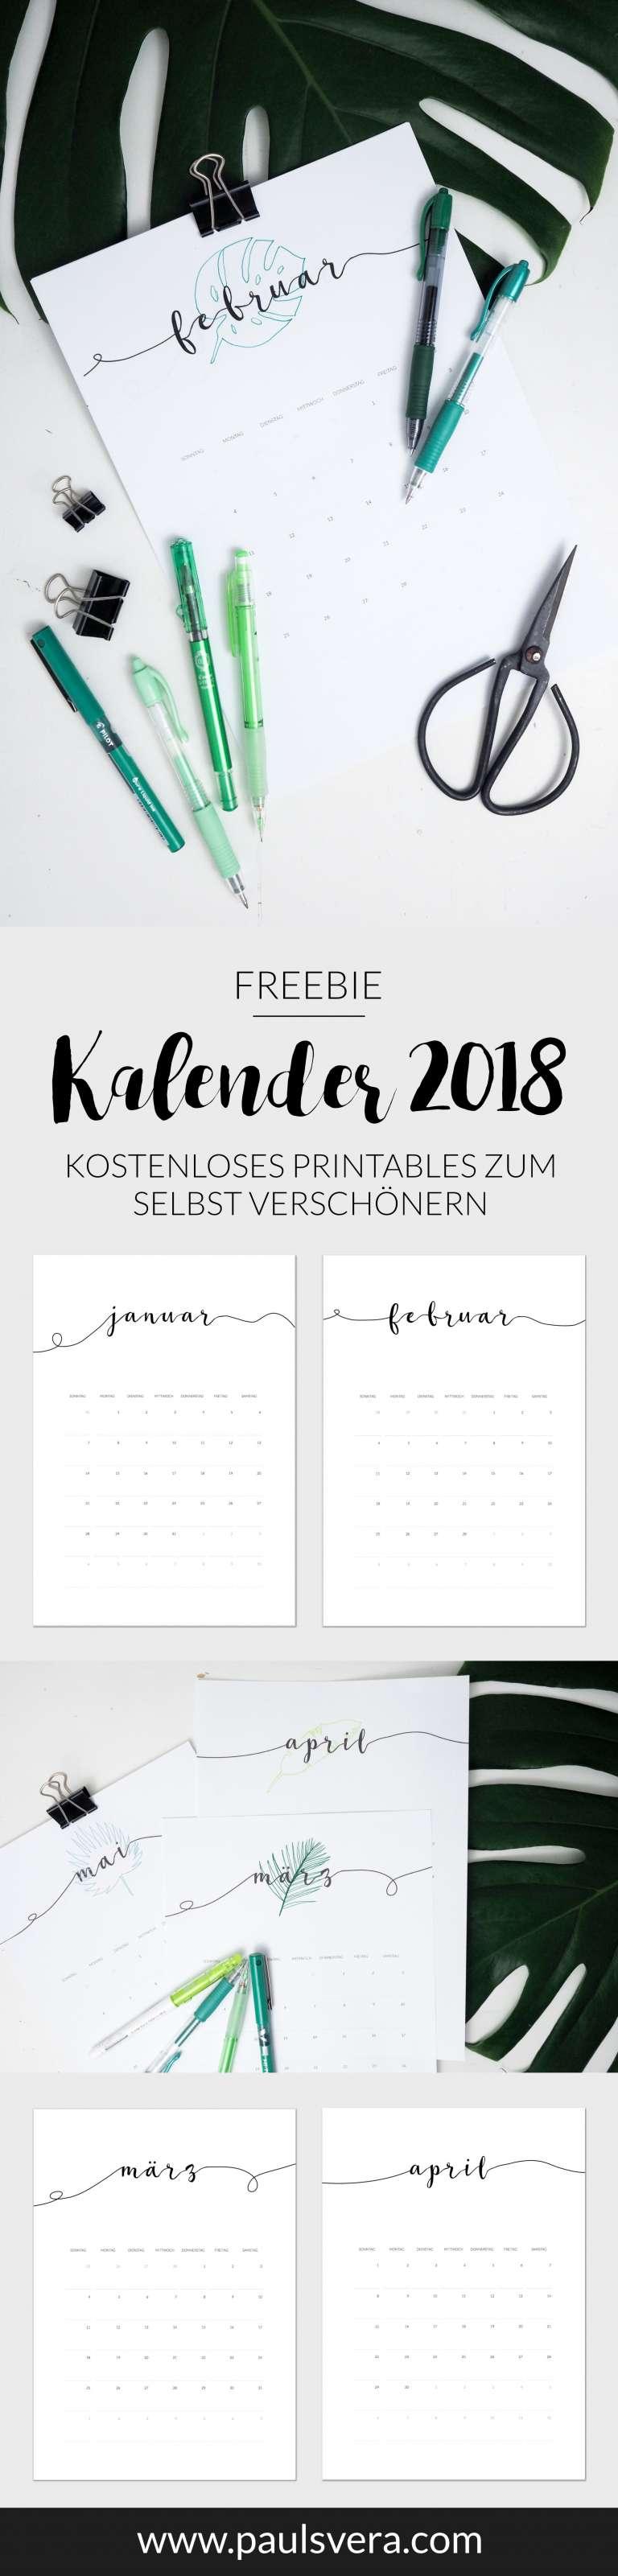 freebie kalender 2018 als kostenloses printables paulsvera. Black Bedroom Furniture Sets. Home Design Ideas